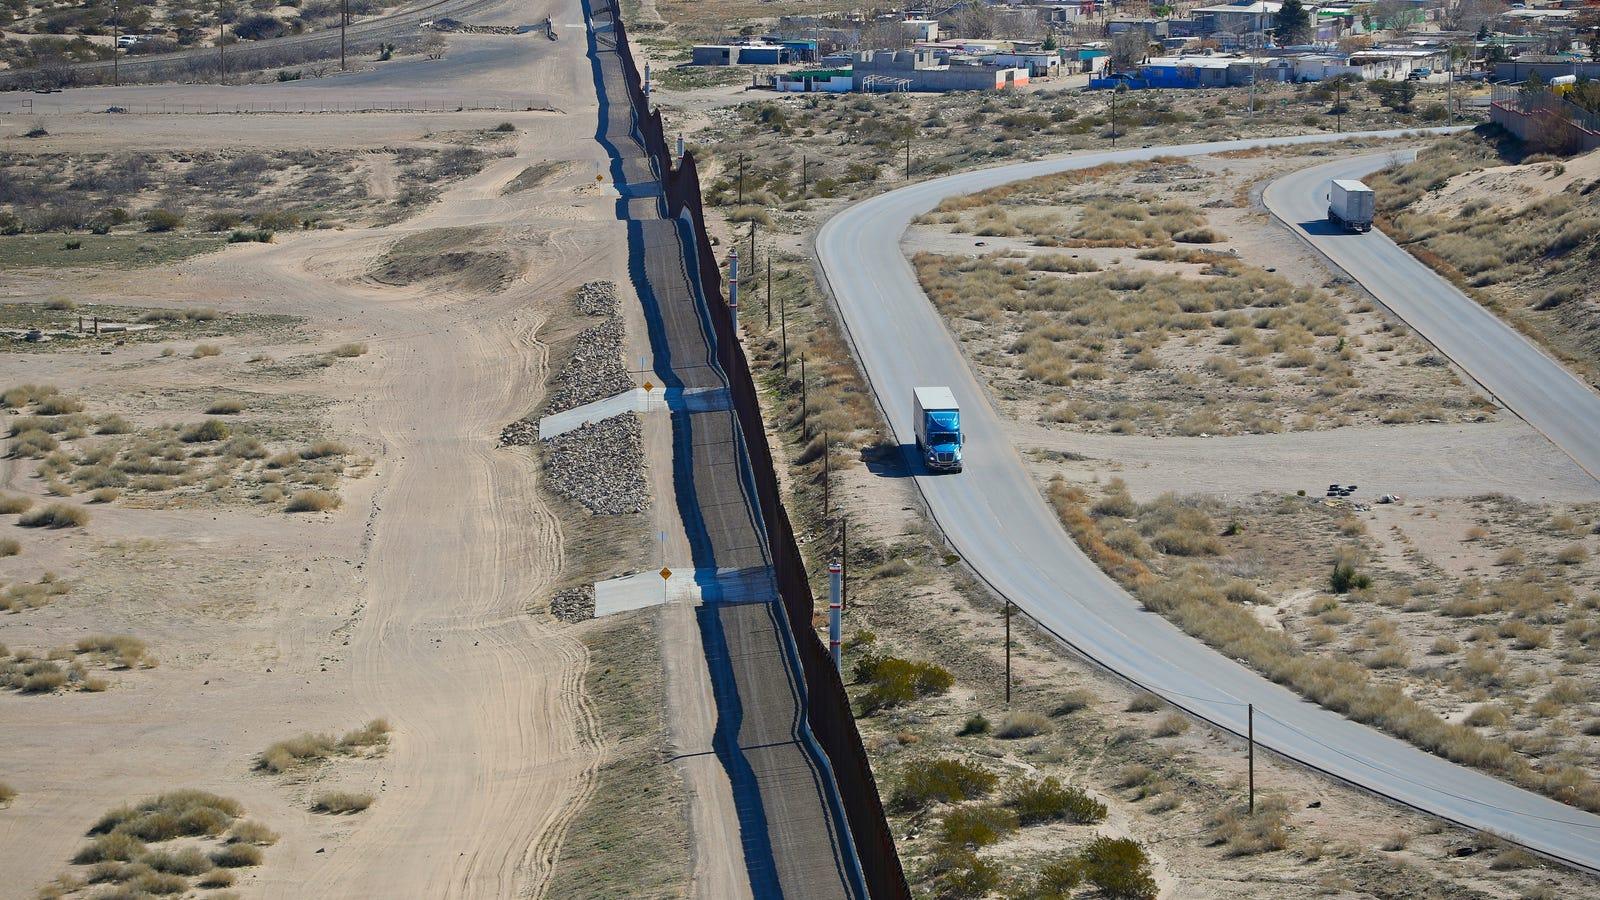 PayPal, GoFundMe Yank Accounts for Far-Right Militia Rounding Up Migrants at Border